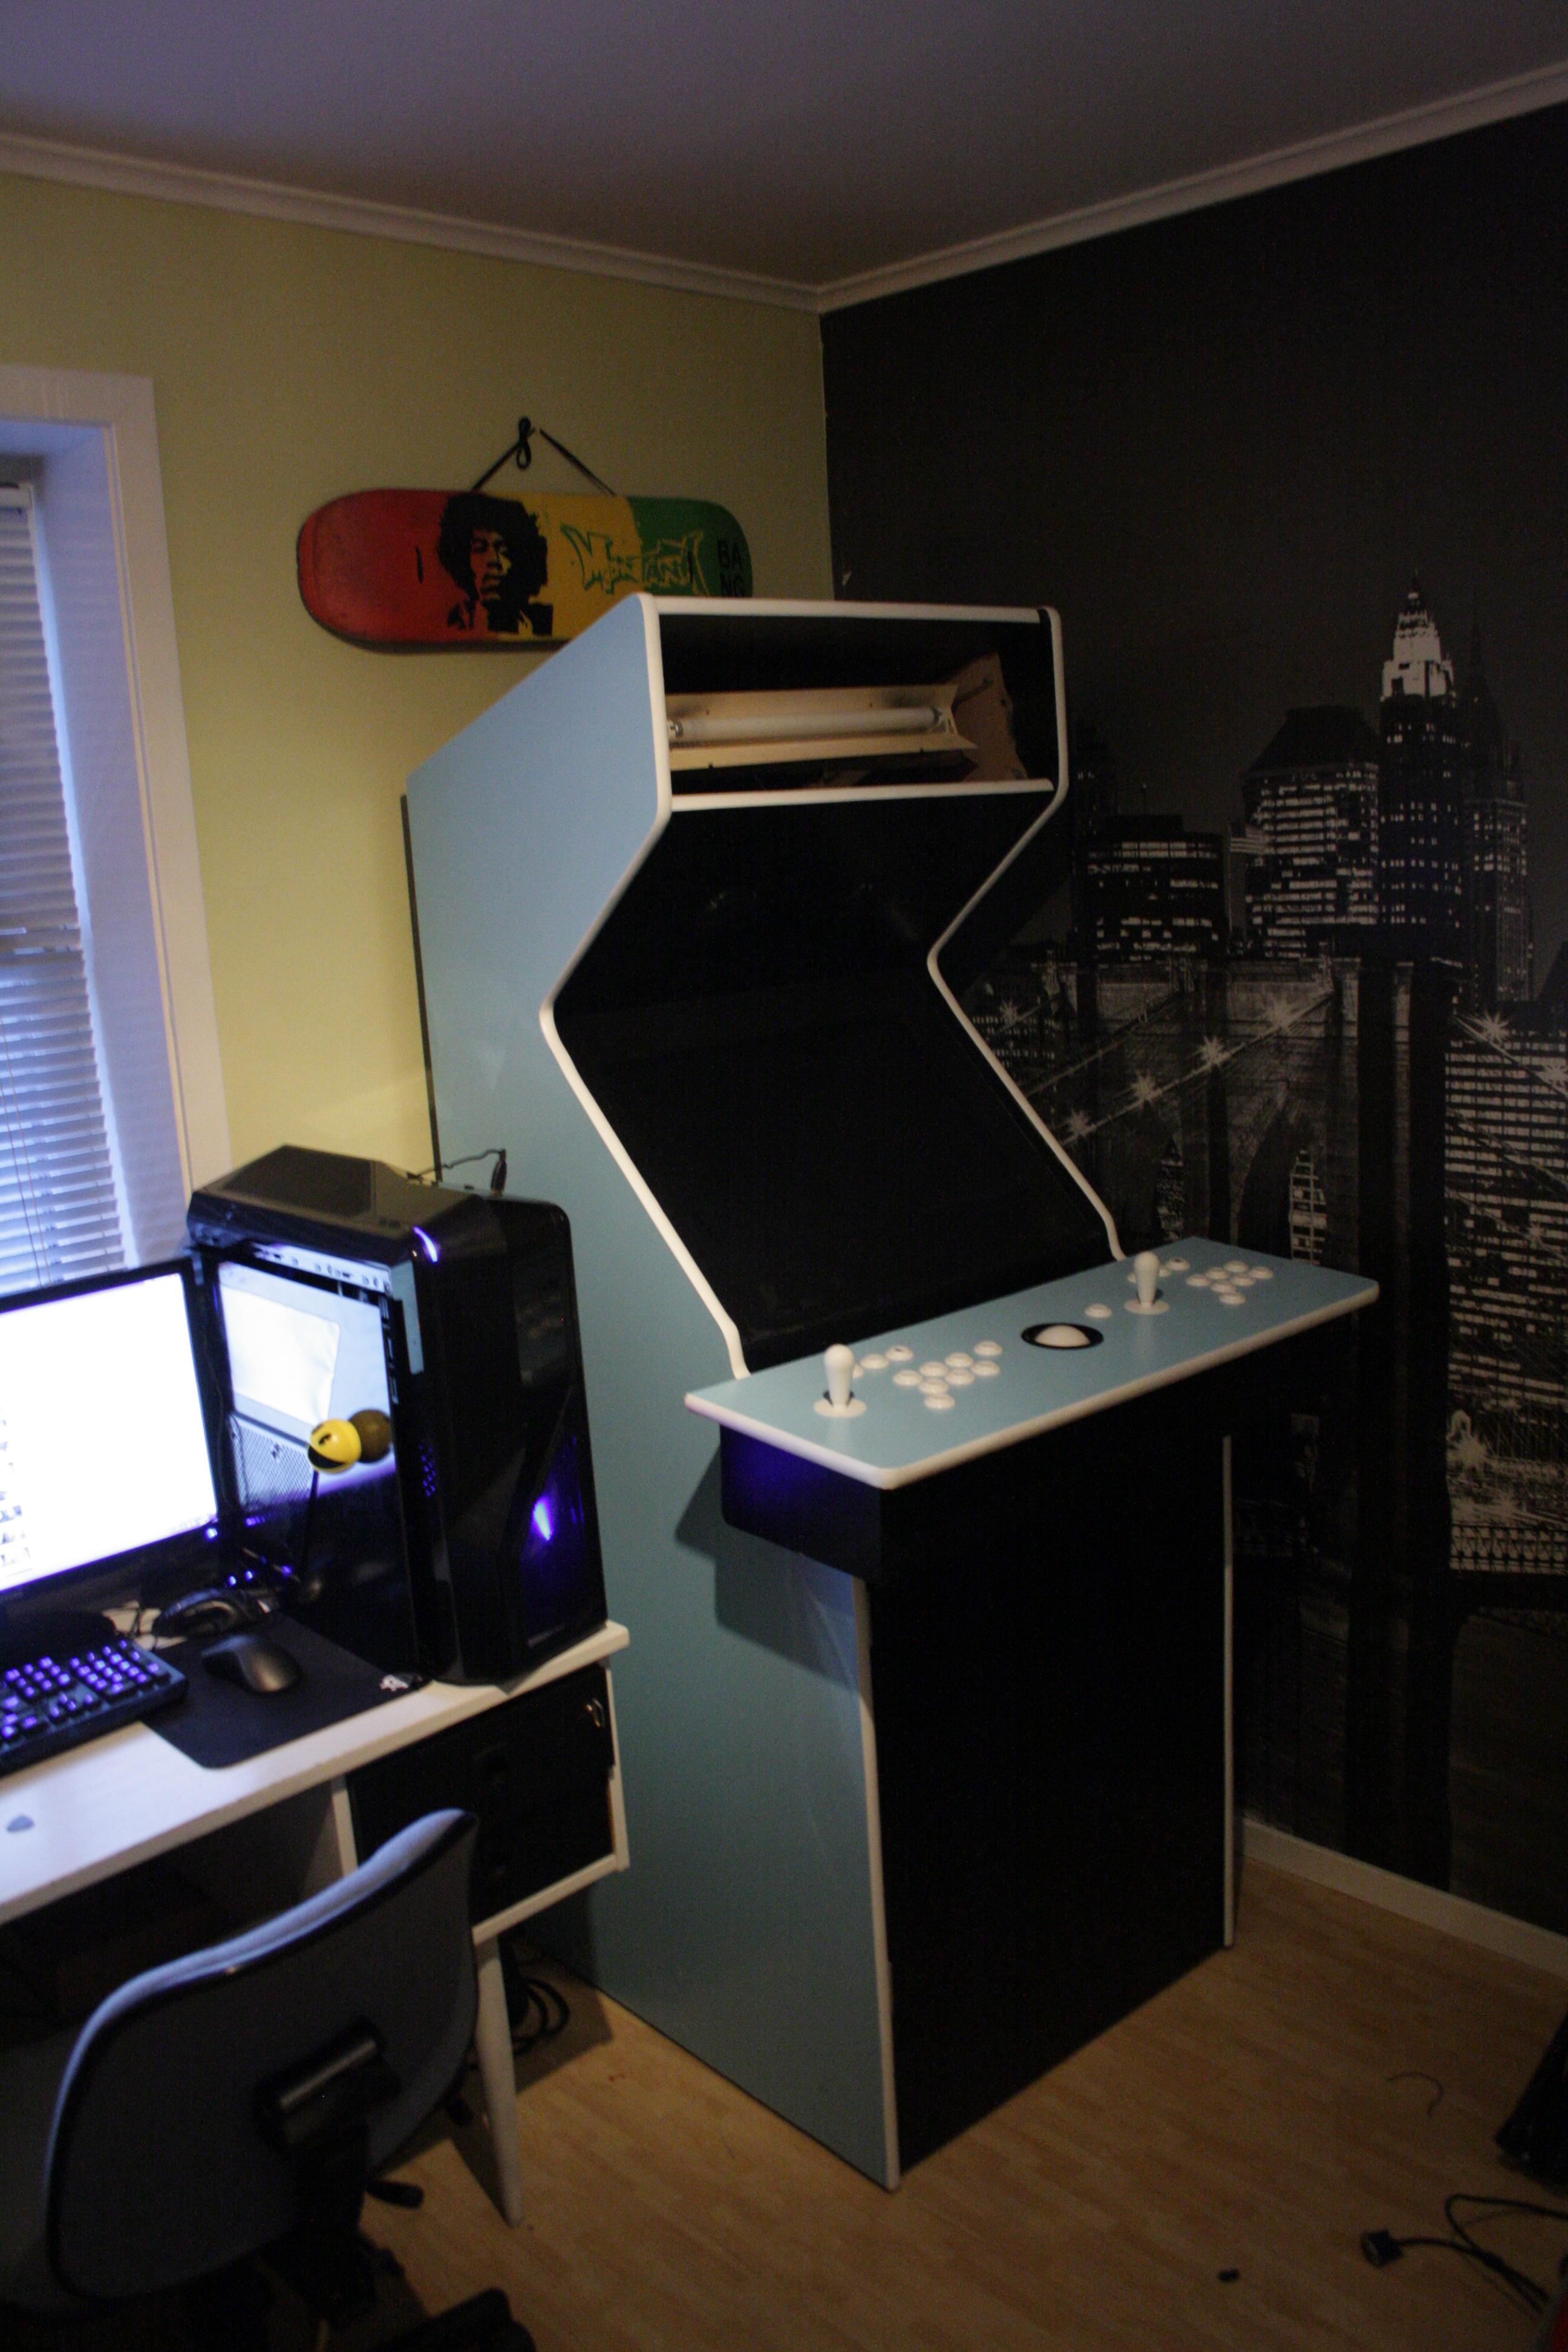 My arcade machine of blue awesomeness